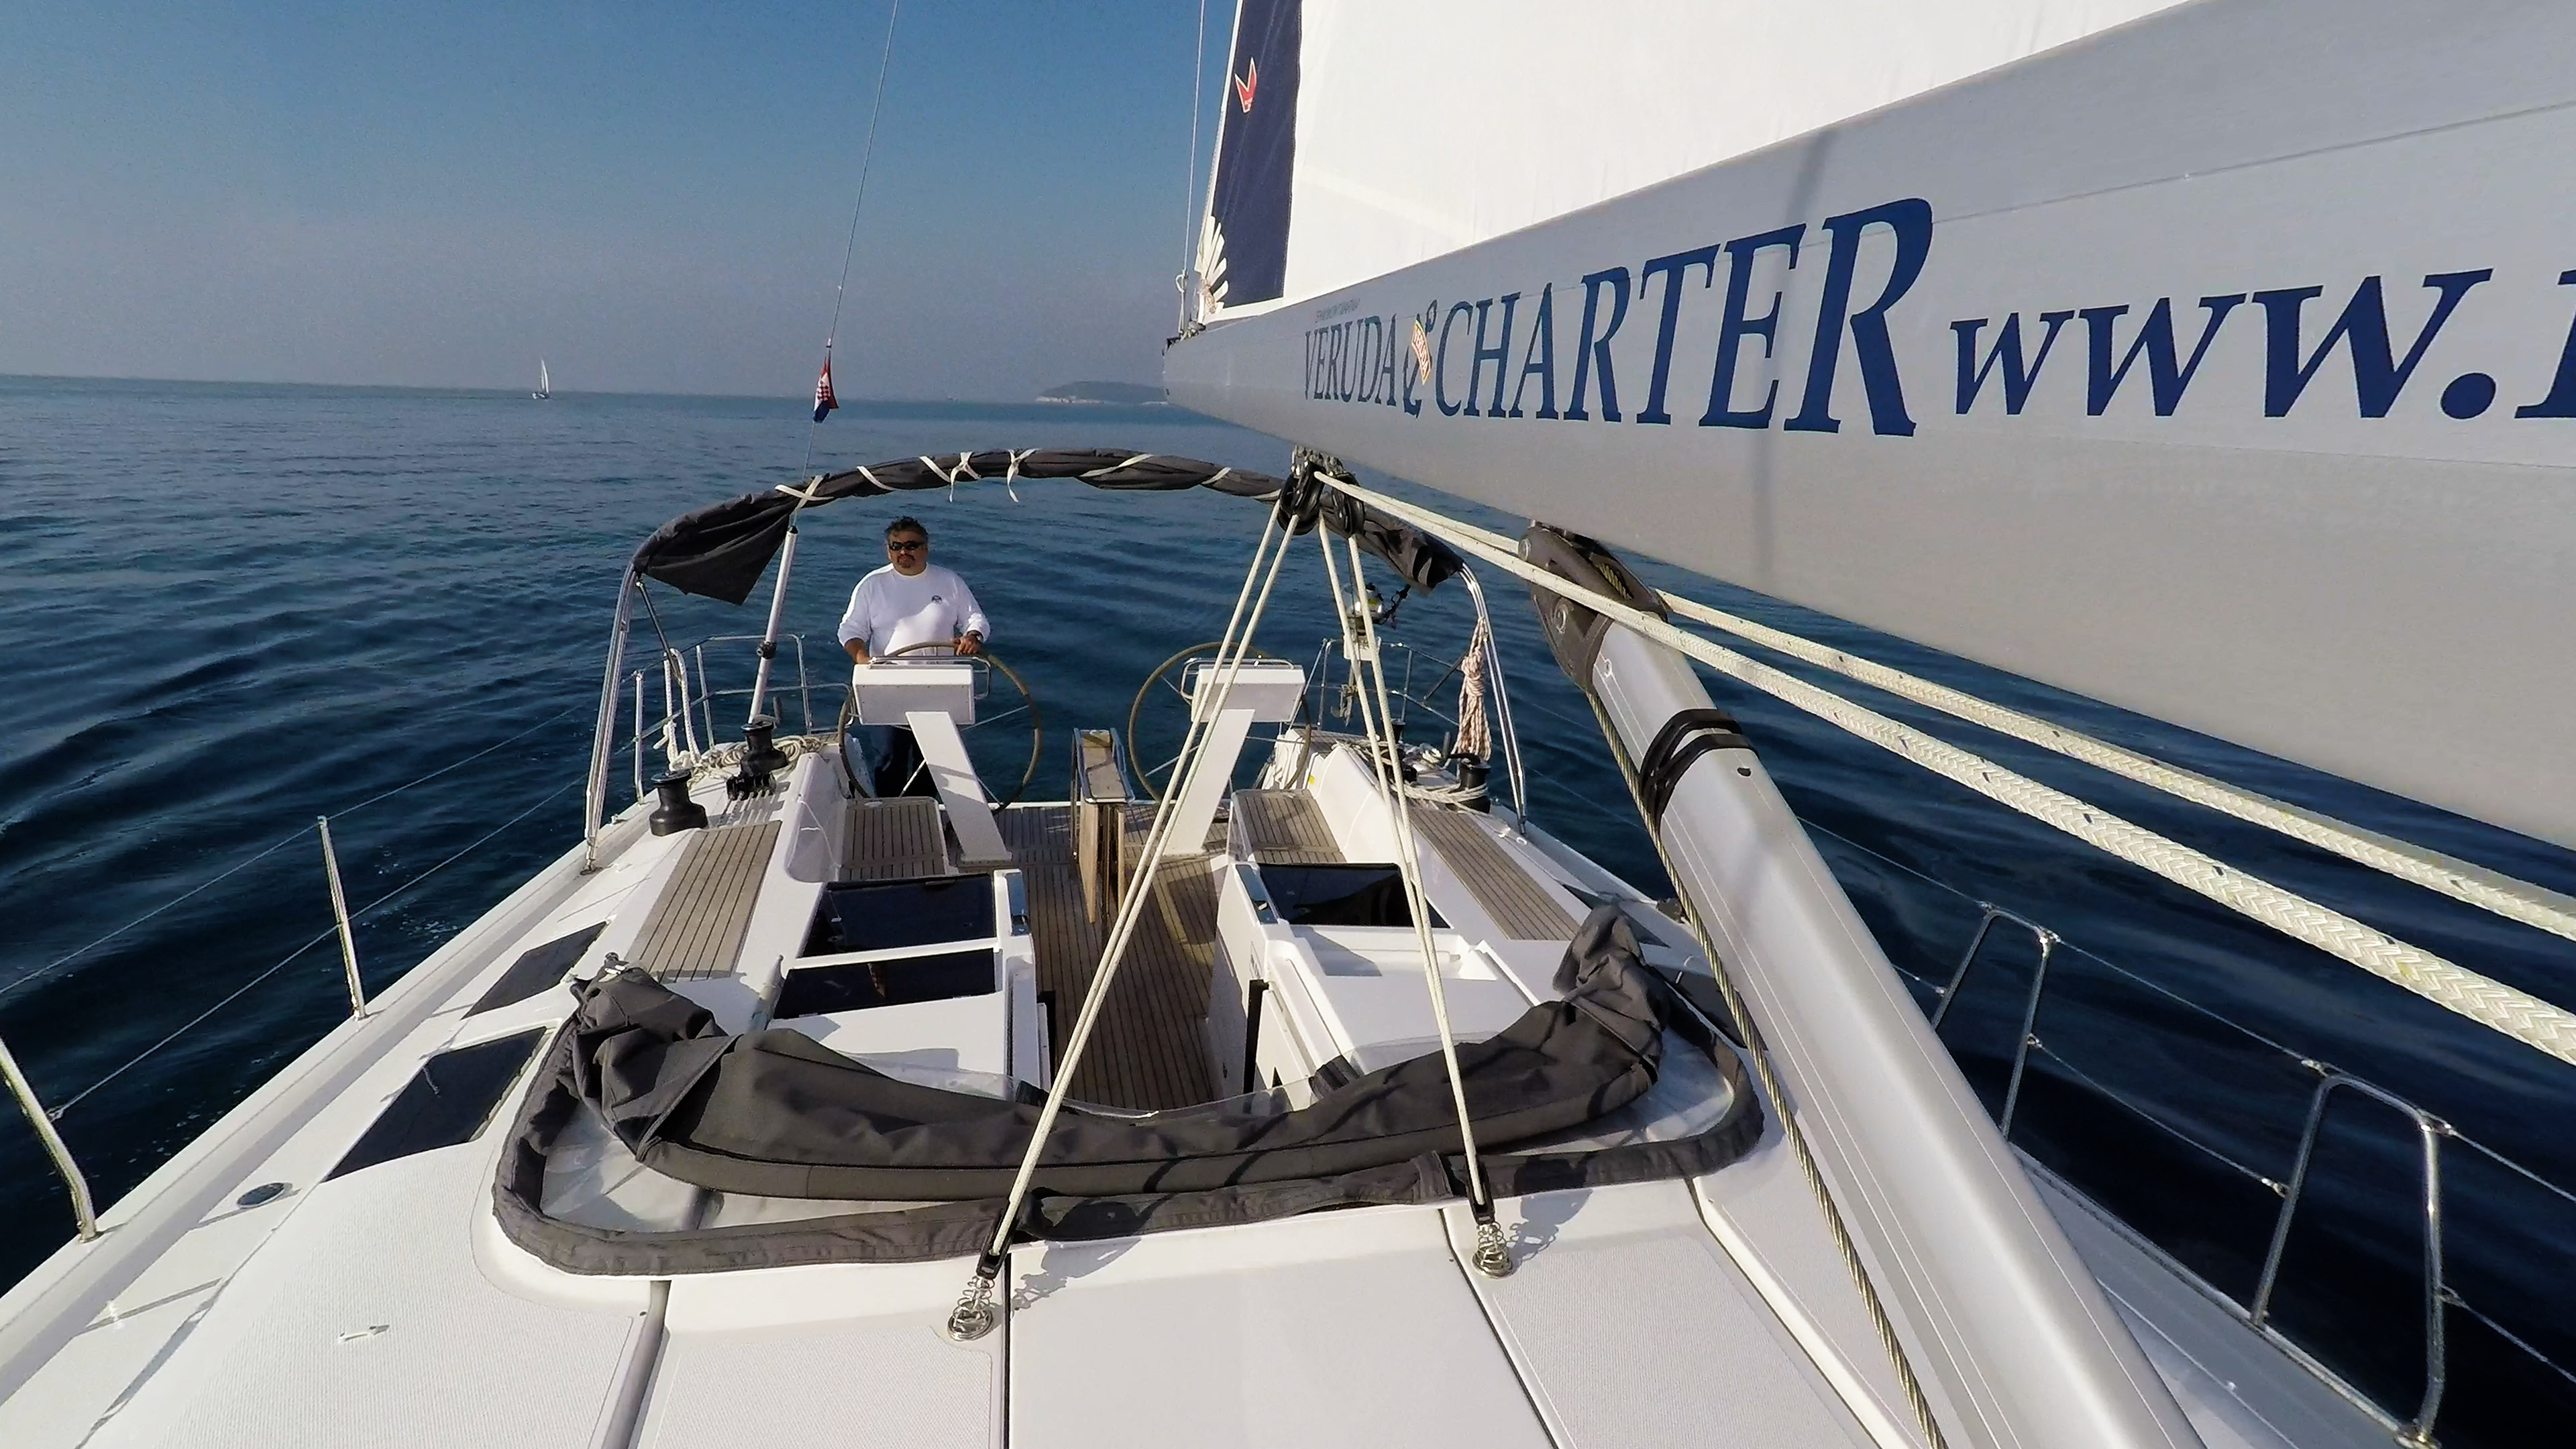 barcha a vela yacht a vela Hanse 505 boma vang vele barca a vela skipper timoni ruota teak pozzetto